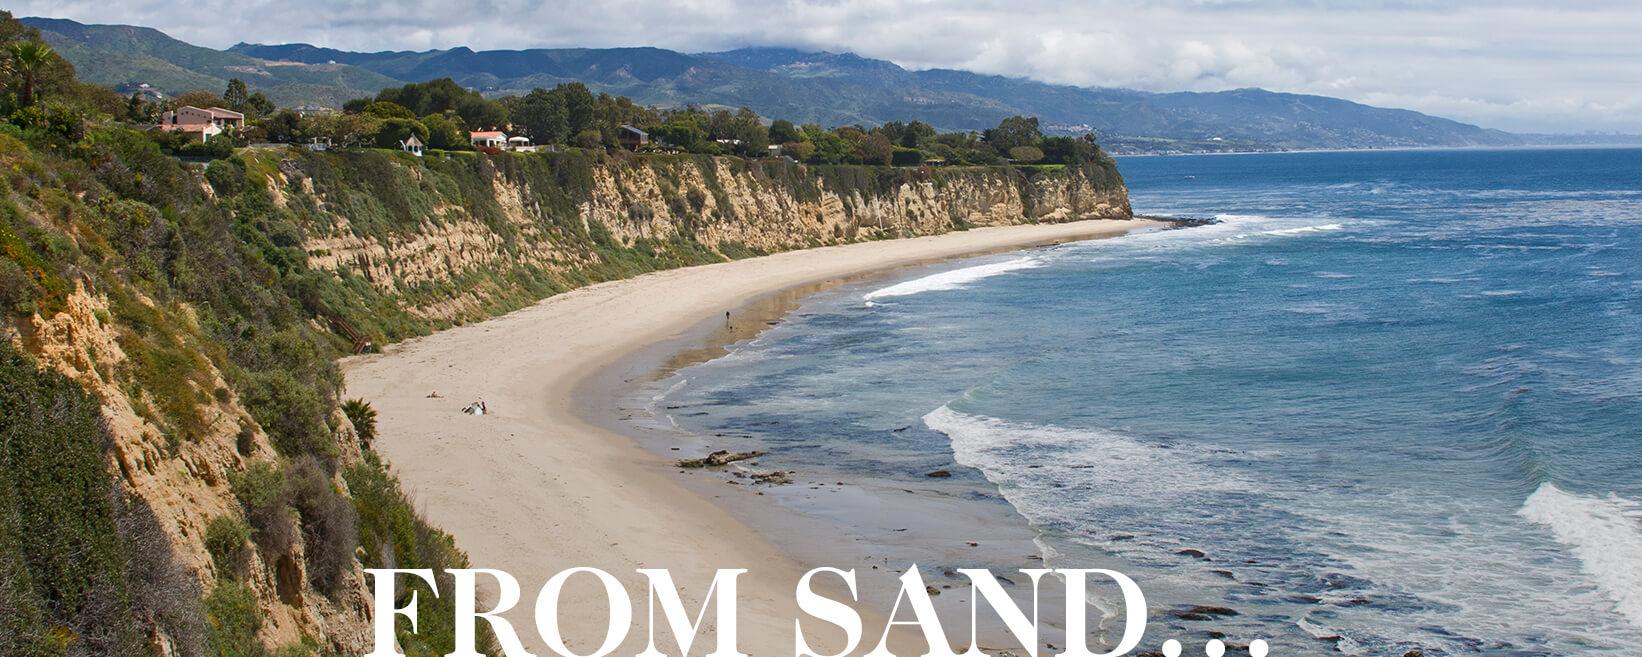 FROM SAND.. hero image of sandy beach